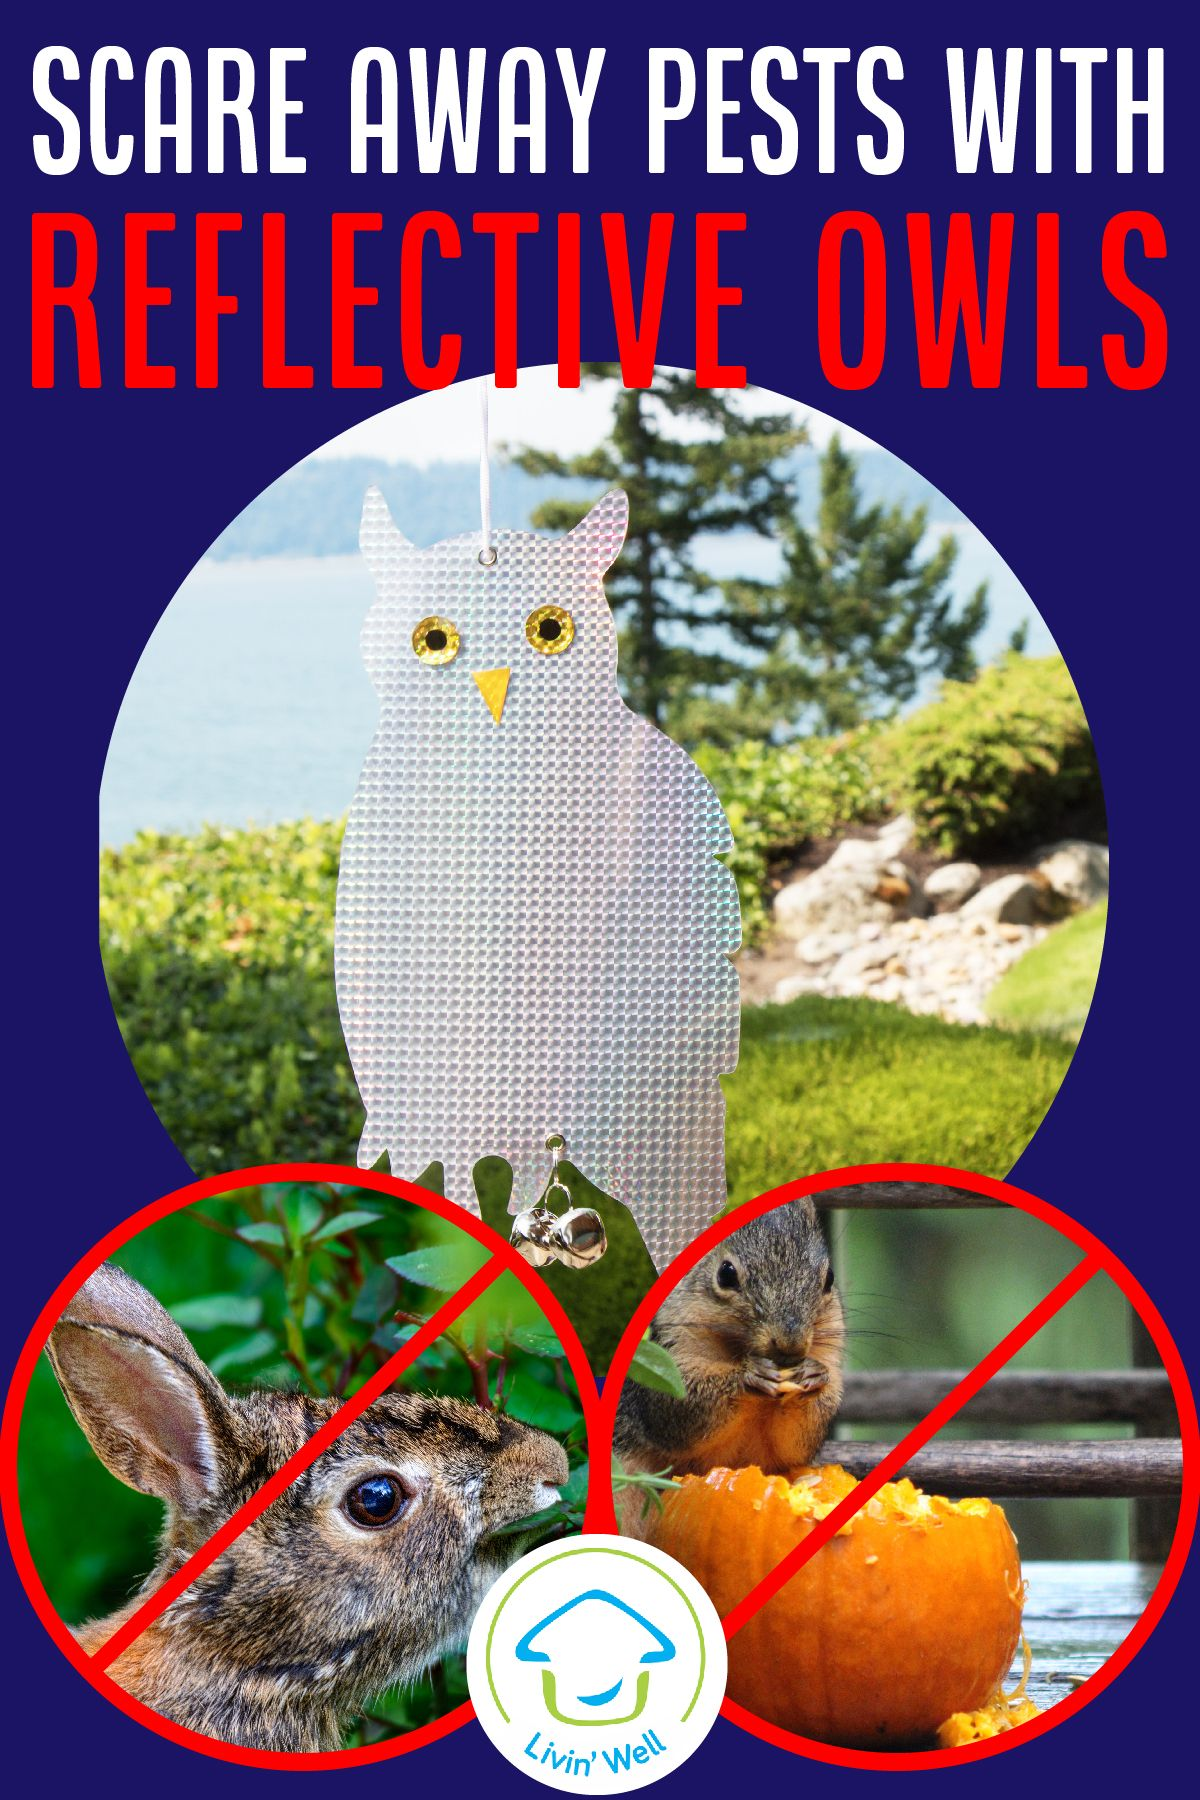 Get reflective bird diverters and bird repellent devices